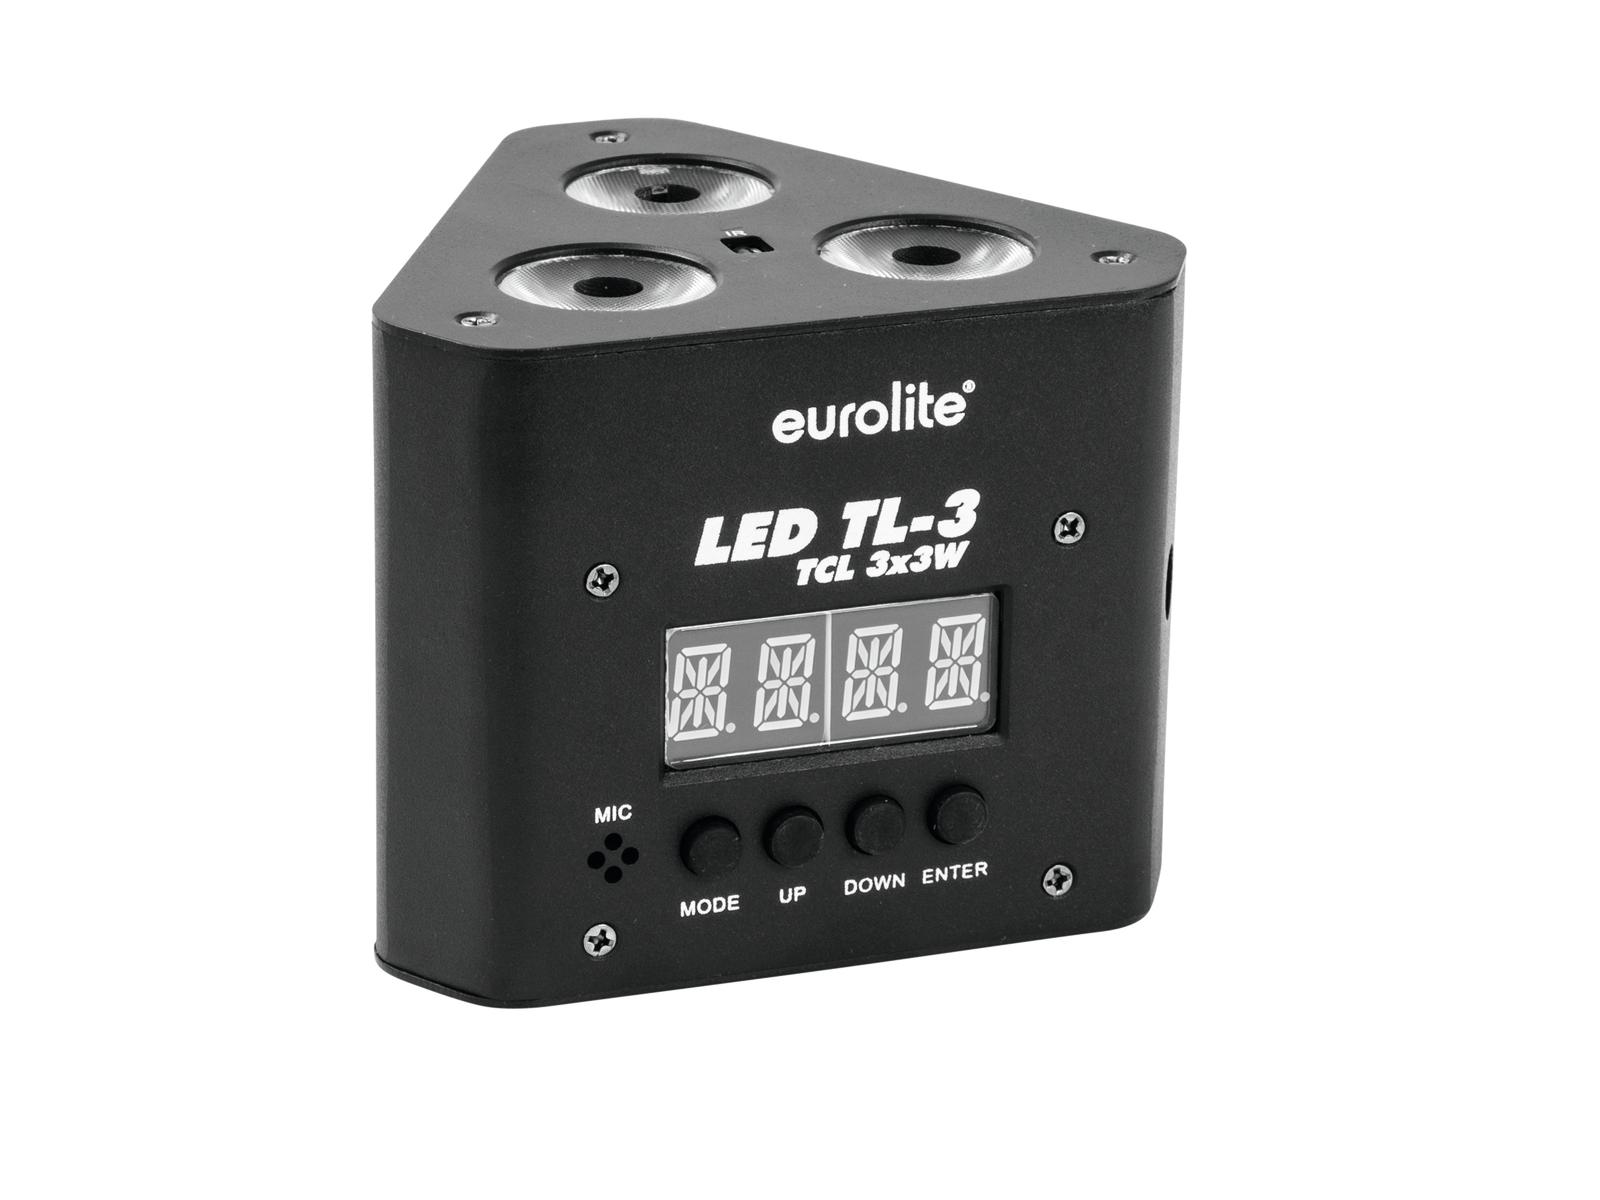 Eurolite LED Trusslight 3x3W TCL, IR